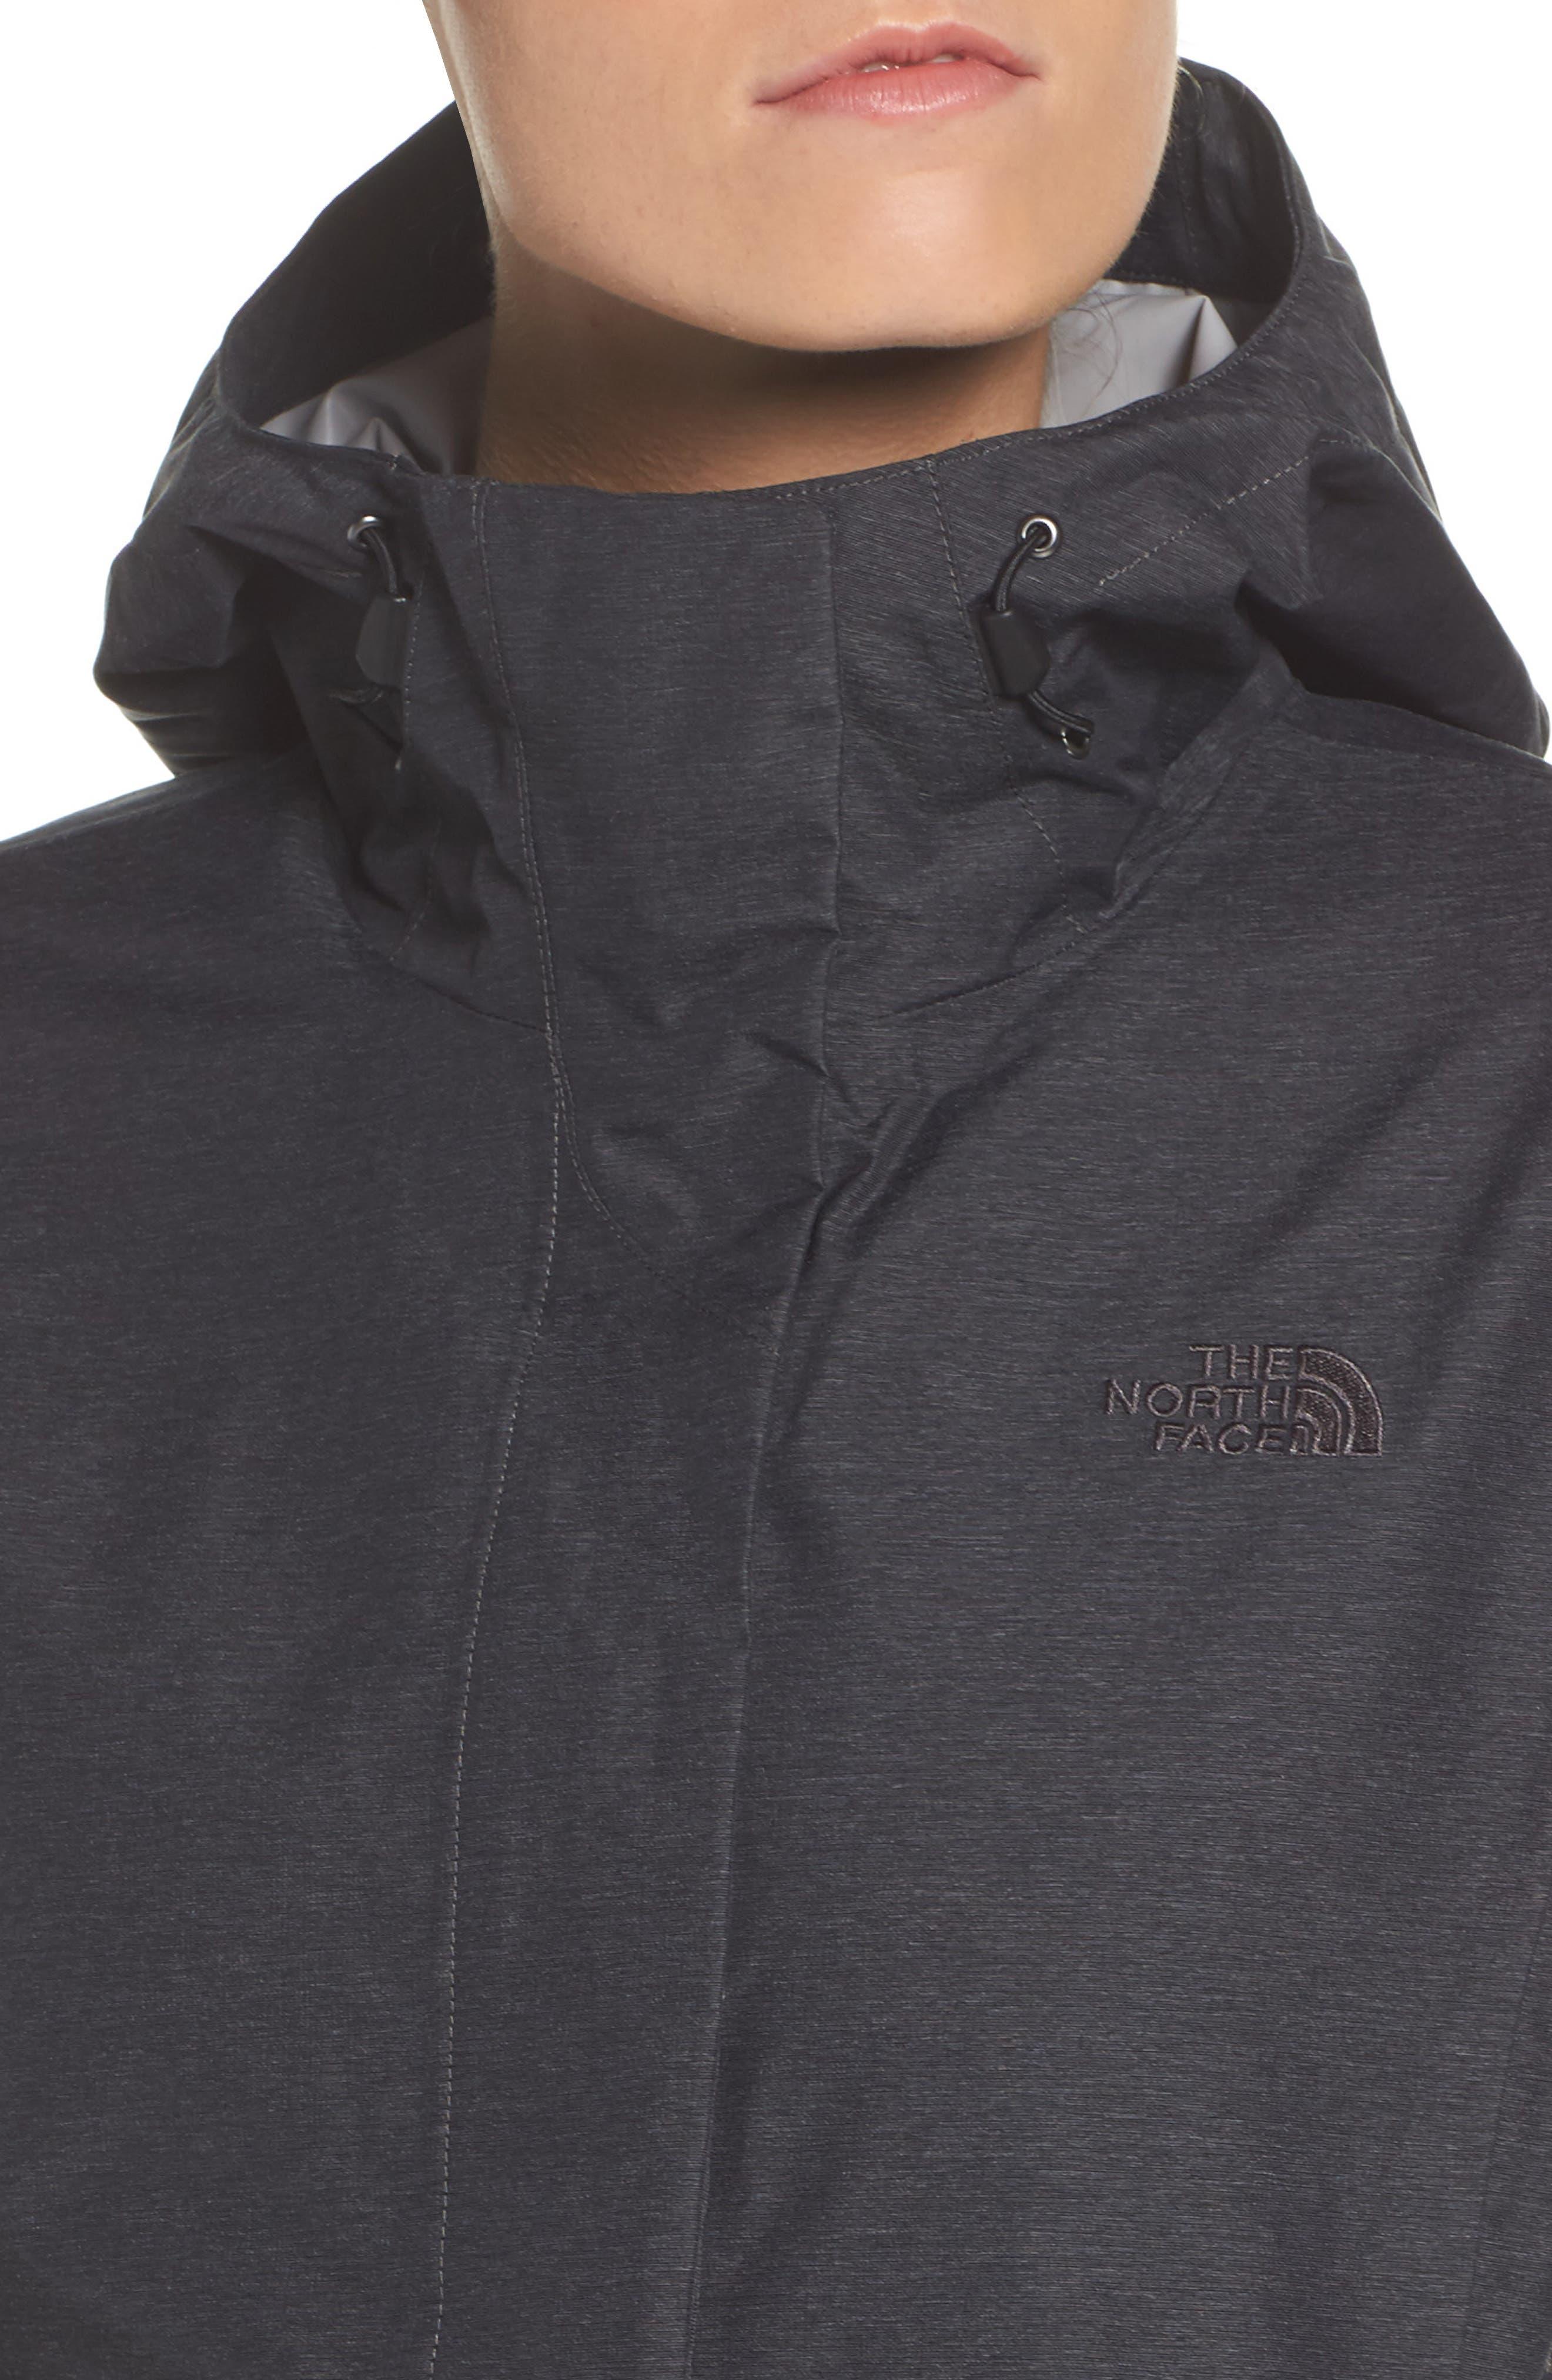 Venture 2 Waterproof Jacket,                             Alternate thumbnail 4, color,                             TNF DARK GREY HEATHER